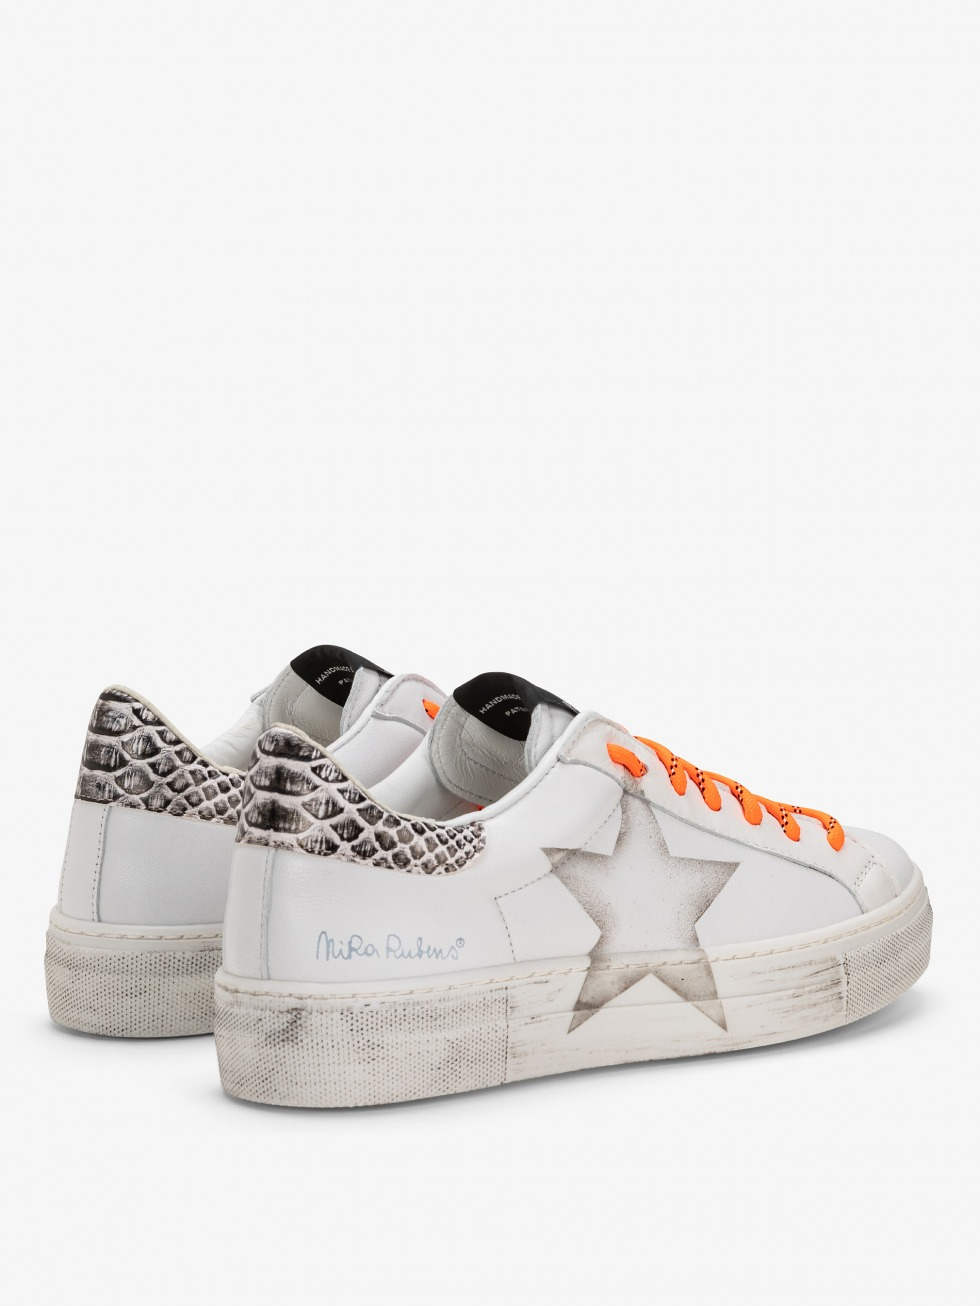 Martini Sneakers - Vintage Cobra Star